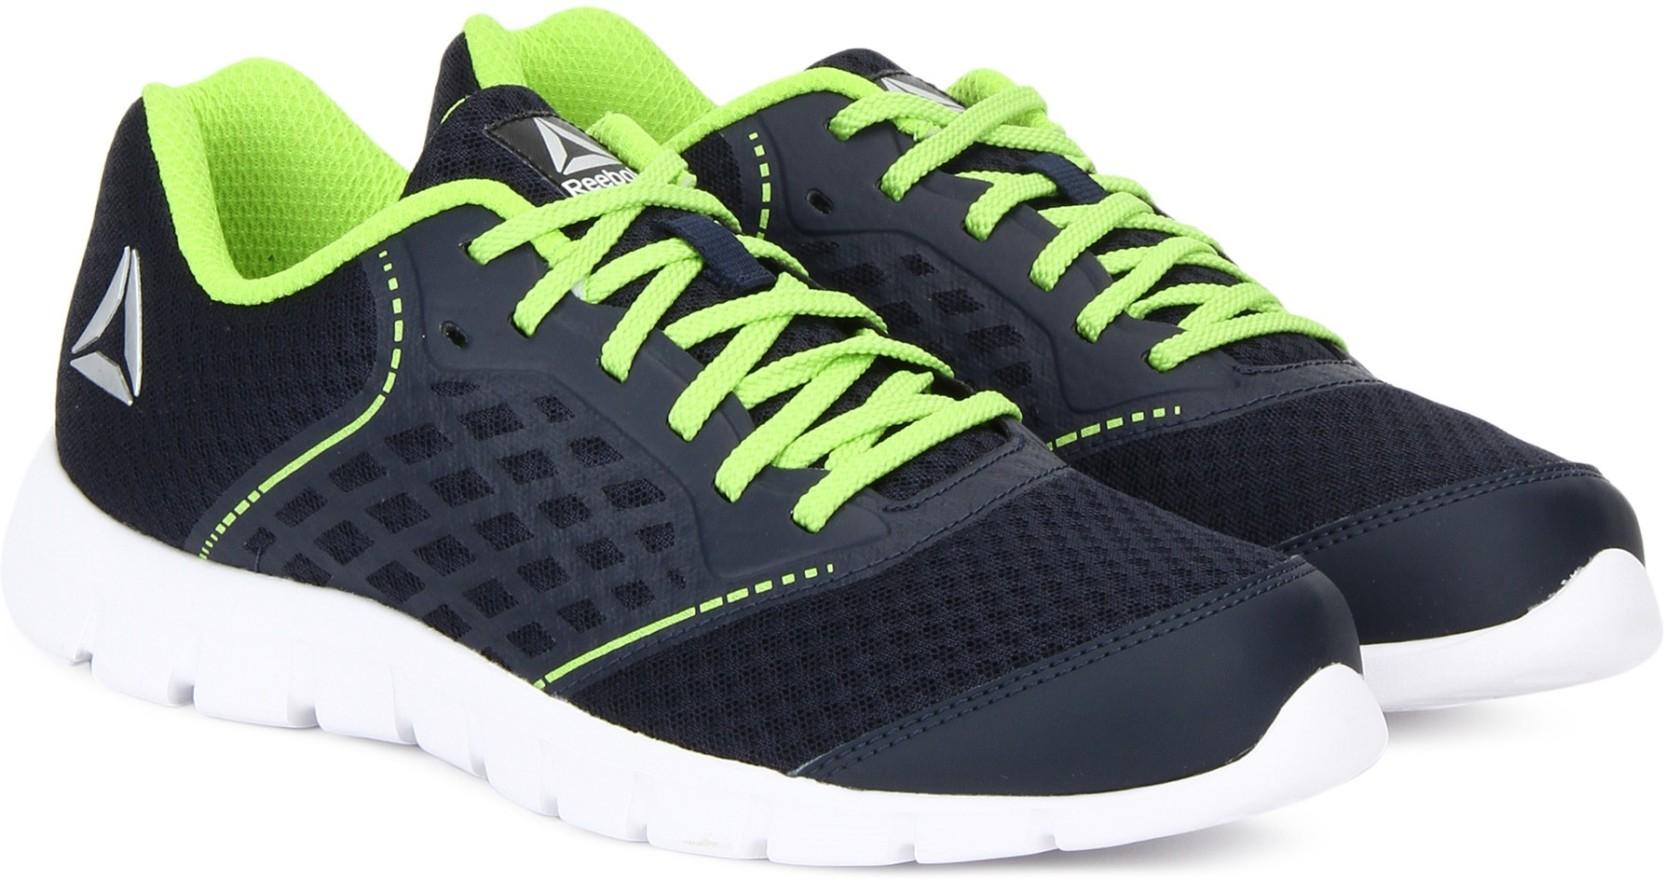 bdf6a2da6db4 Flipkart Men S Footwear Shoes Sports Reebok Brand - Style Guru ...